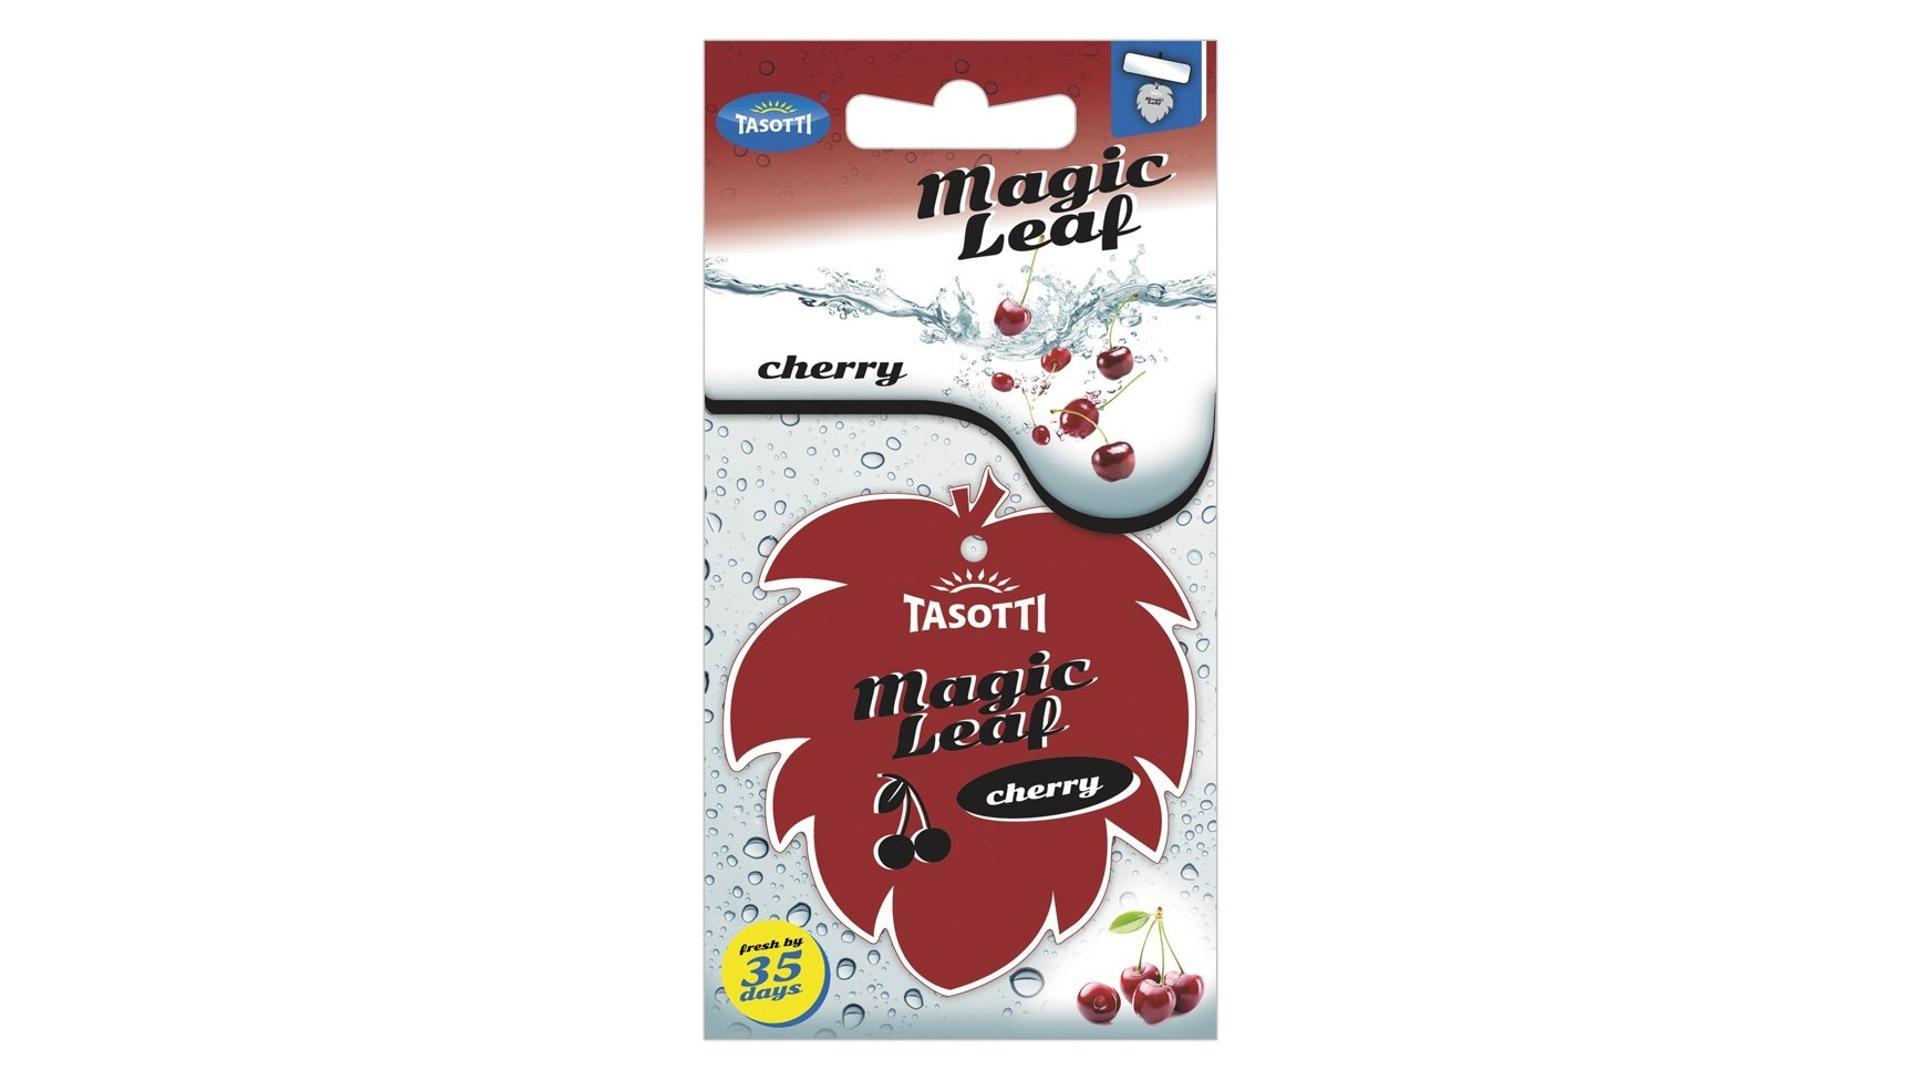 TASOTTI Magic cherry